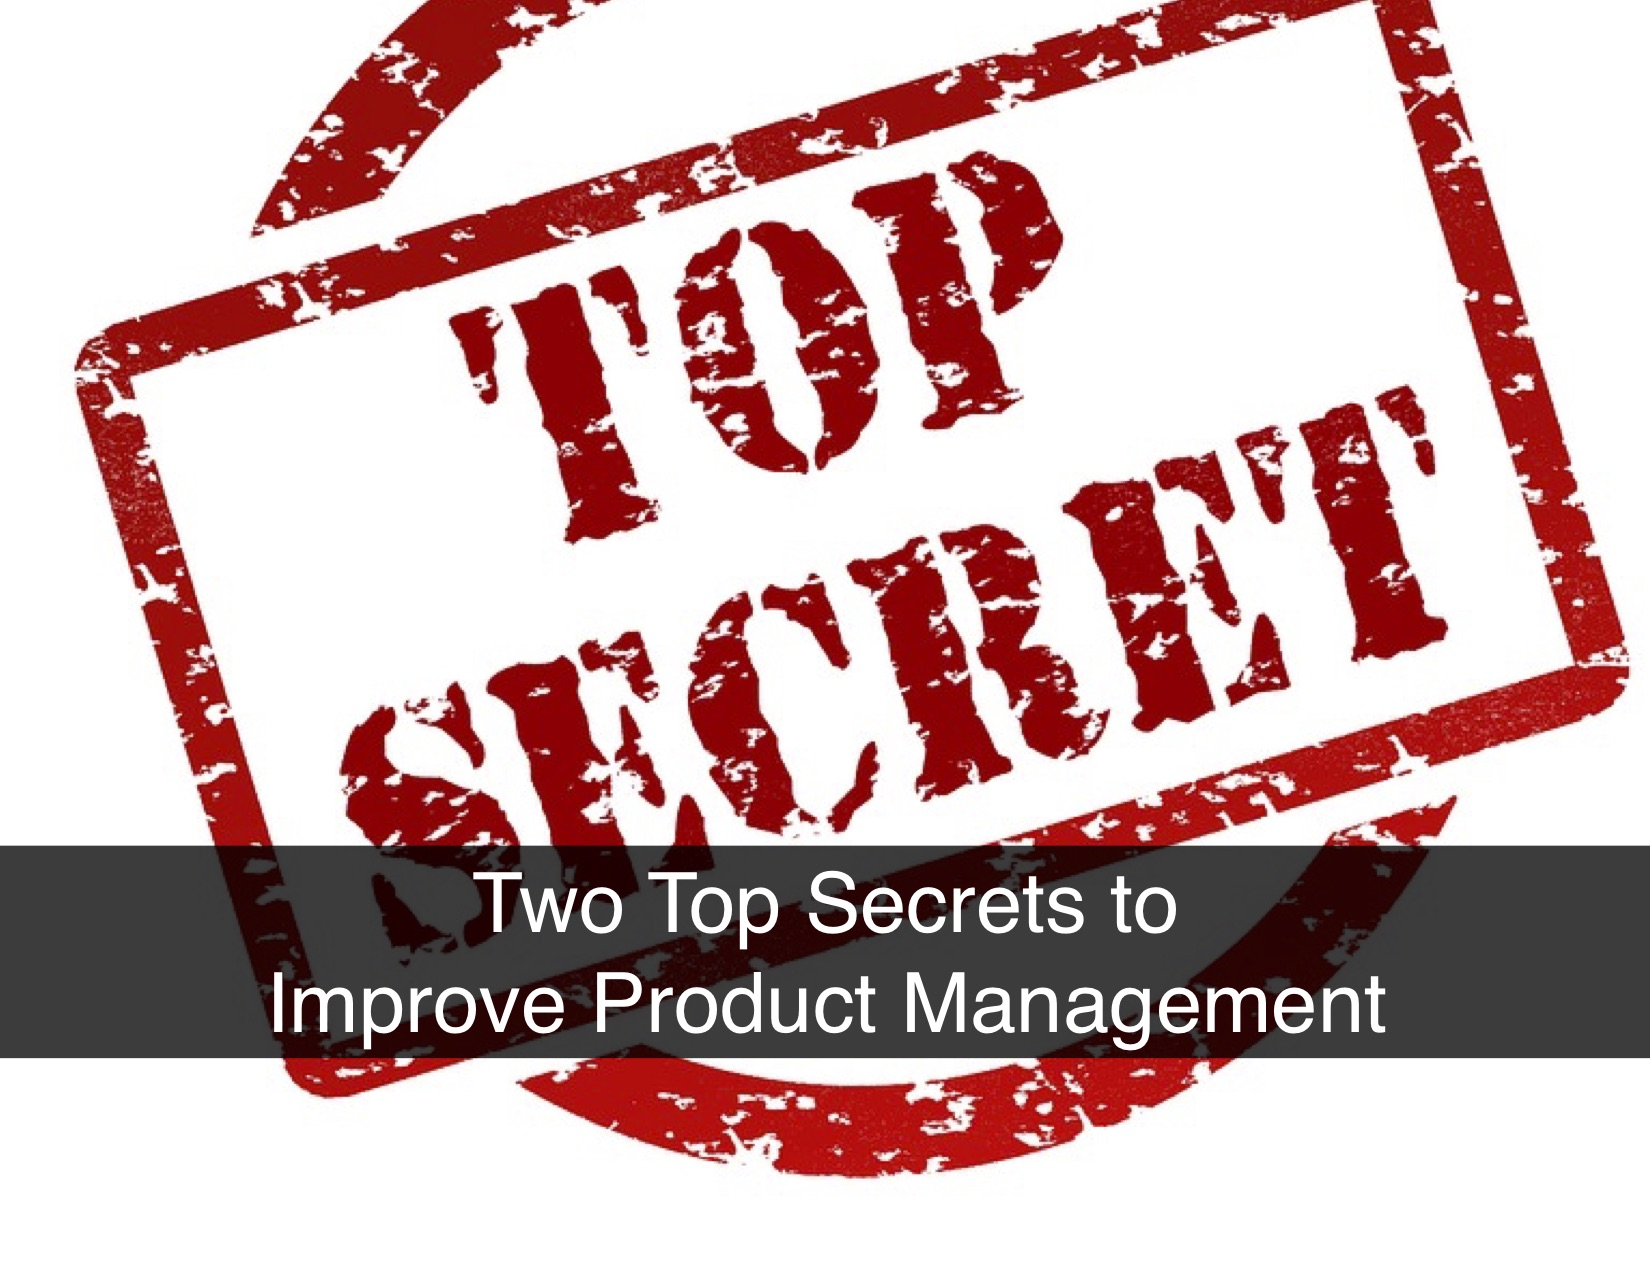 Top Secrects